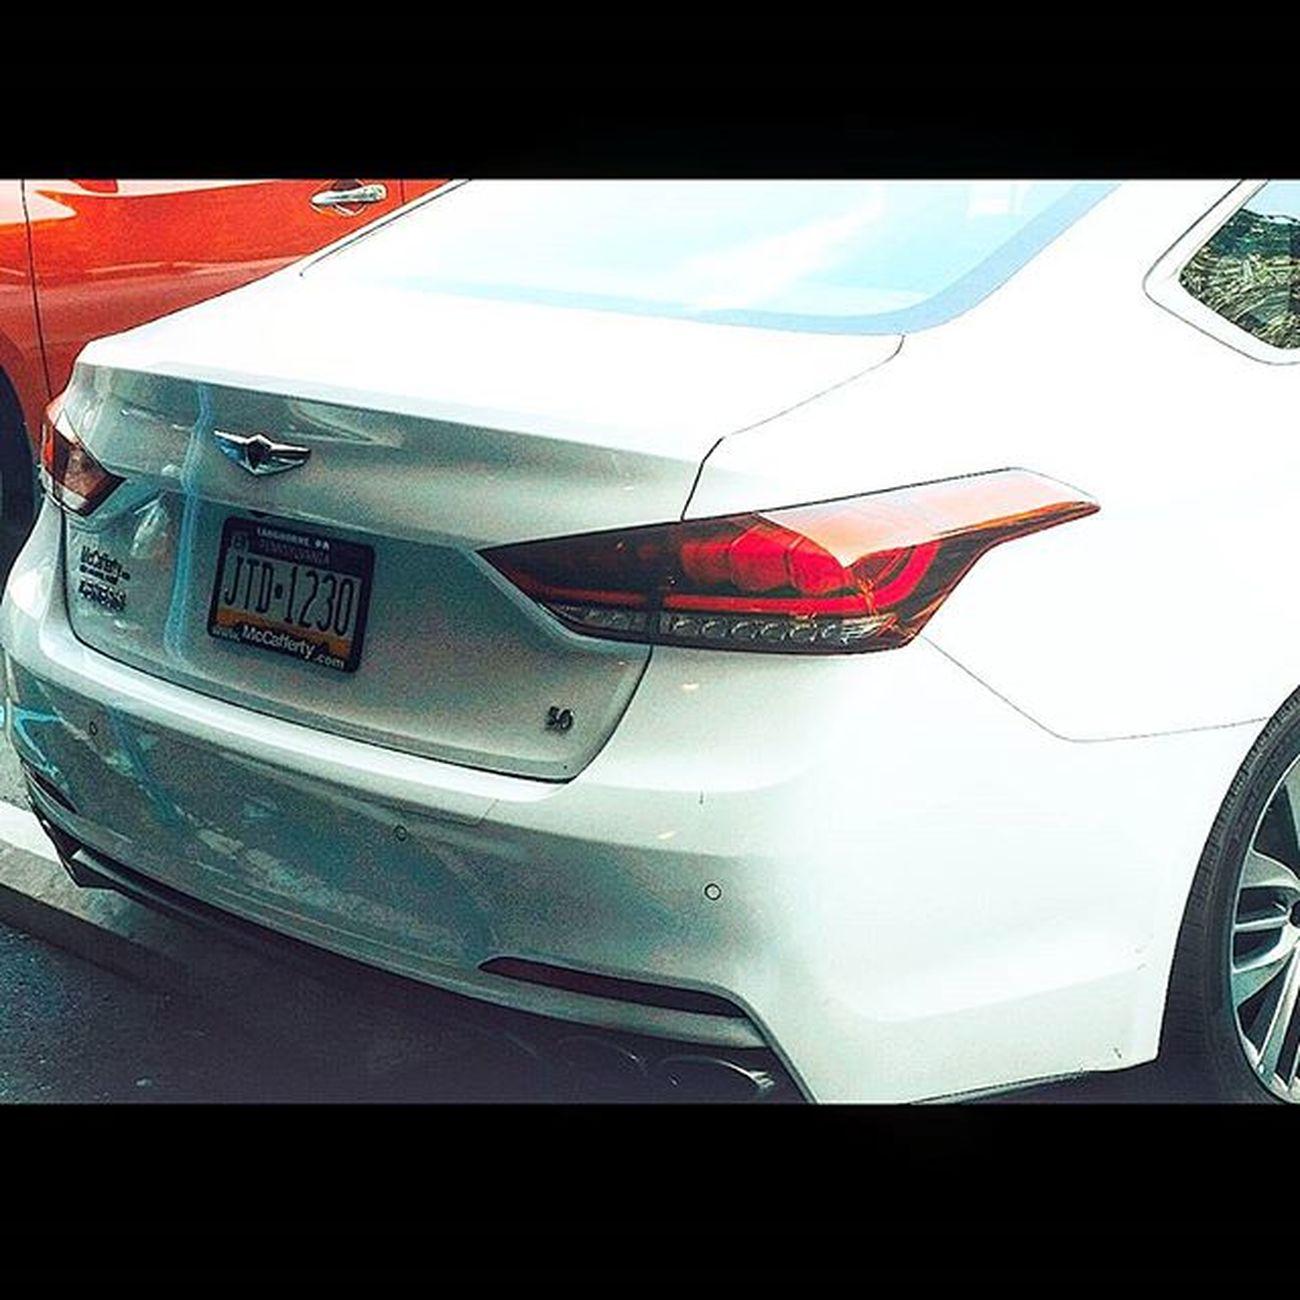 That 5.0 though! 😲😋 Hyundai Kdm Genny Genesis Gensedanrspec Gensedan Fourdoorb Rpsec